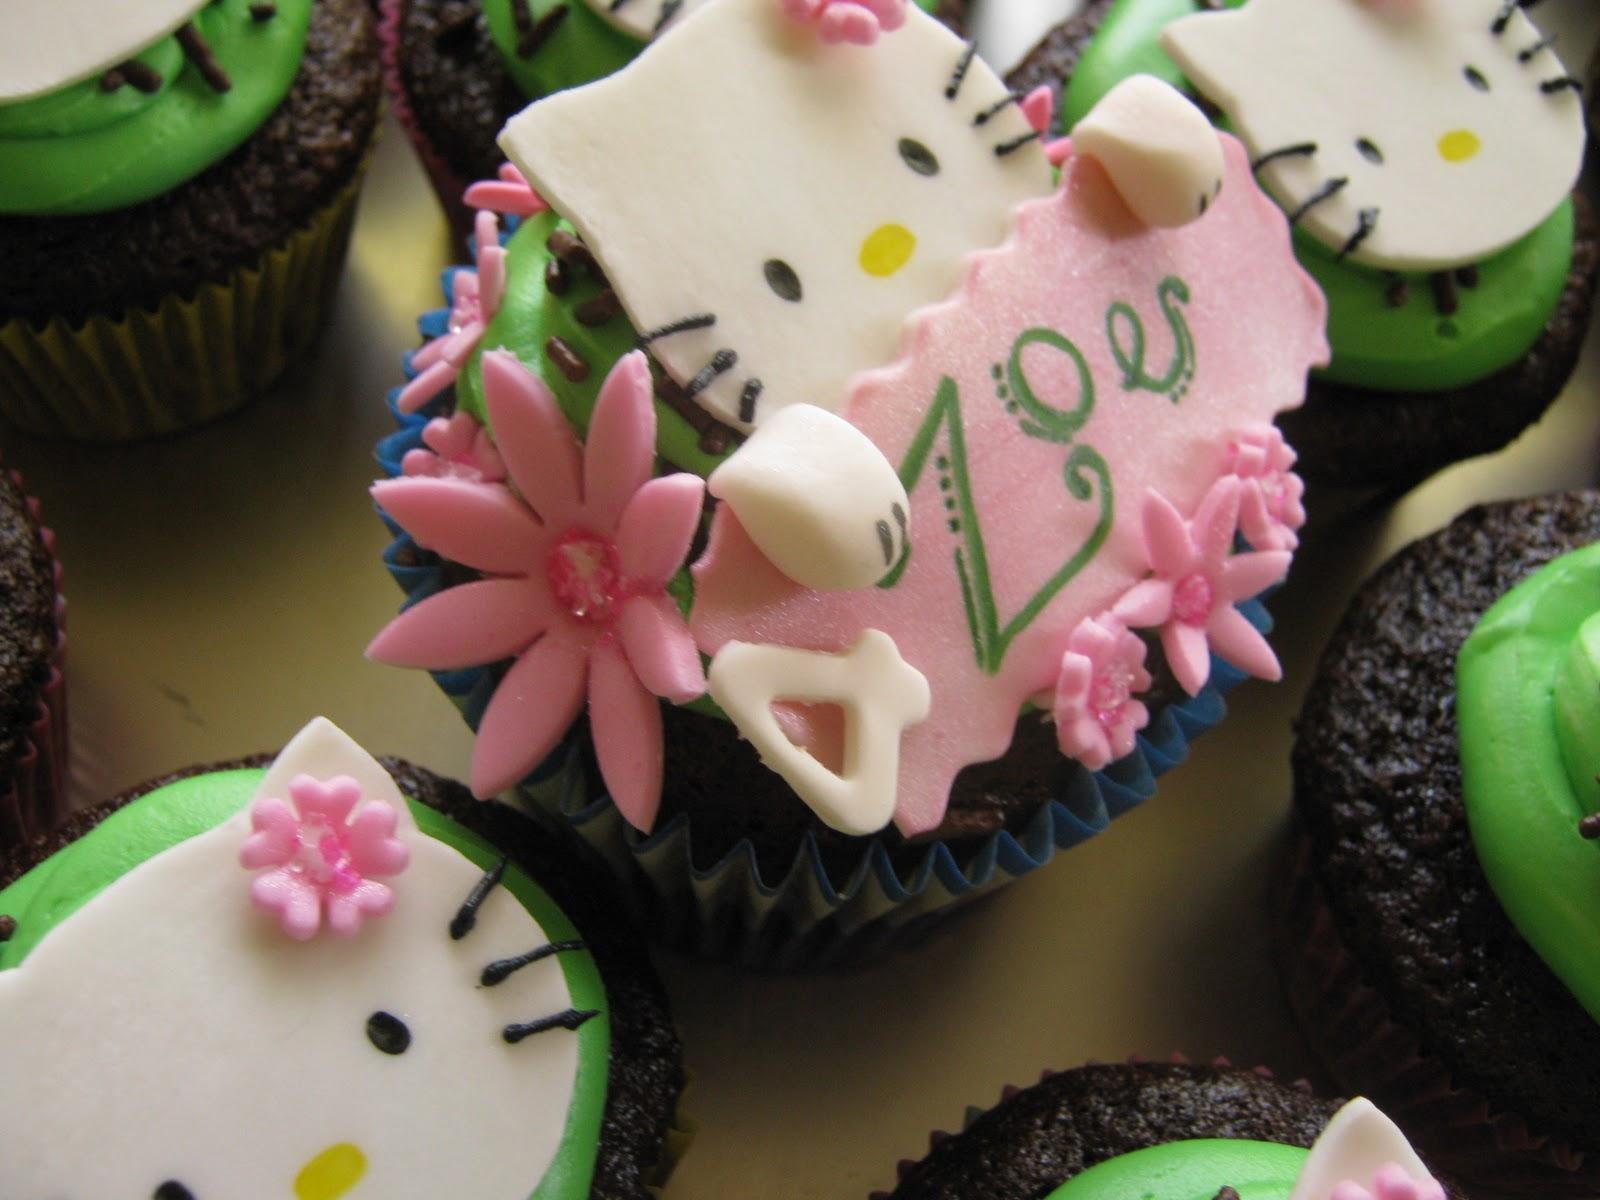 http://2.bp.blogspot.com/_-lH5iR9rvNw/TNMuVojDUaI/AAAAAAAAABk/uv3pGBsegb4/s1600/Birthday%20cakes%20summer%202010%20165.JPG